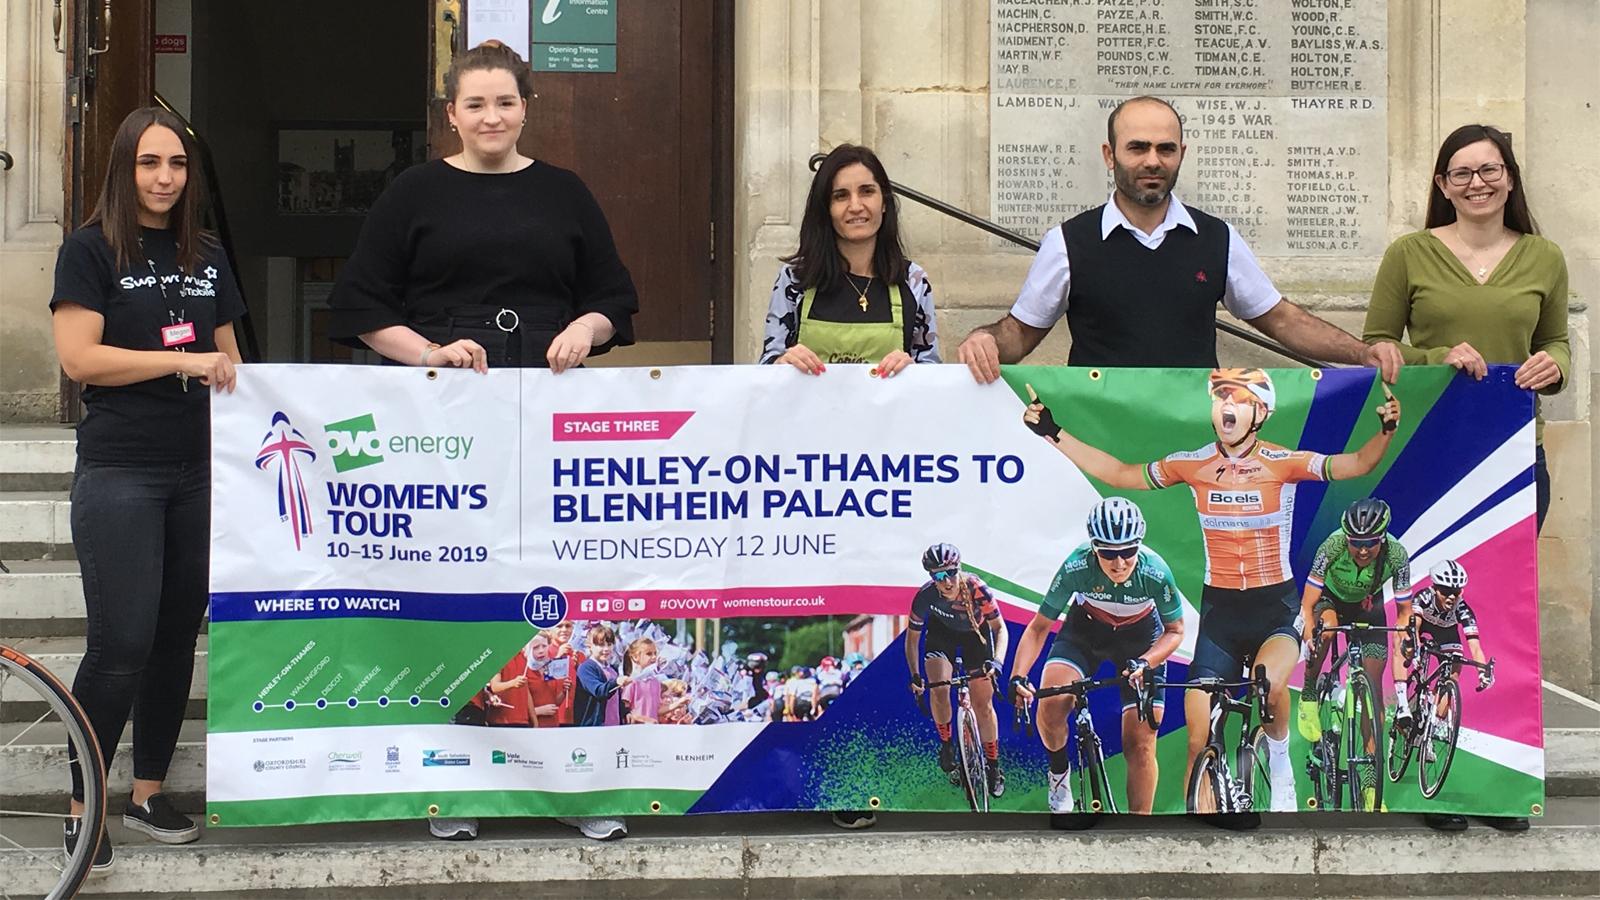 Oxfordshire Women's Tour